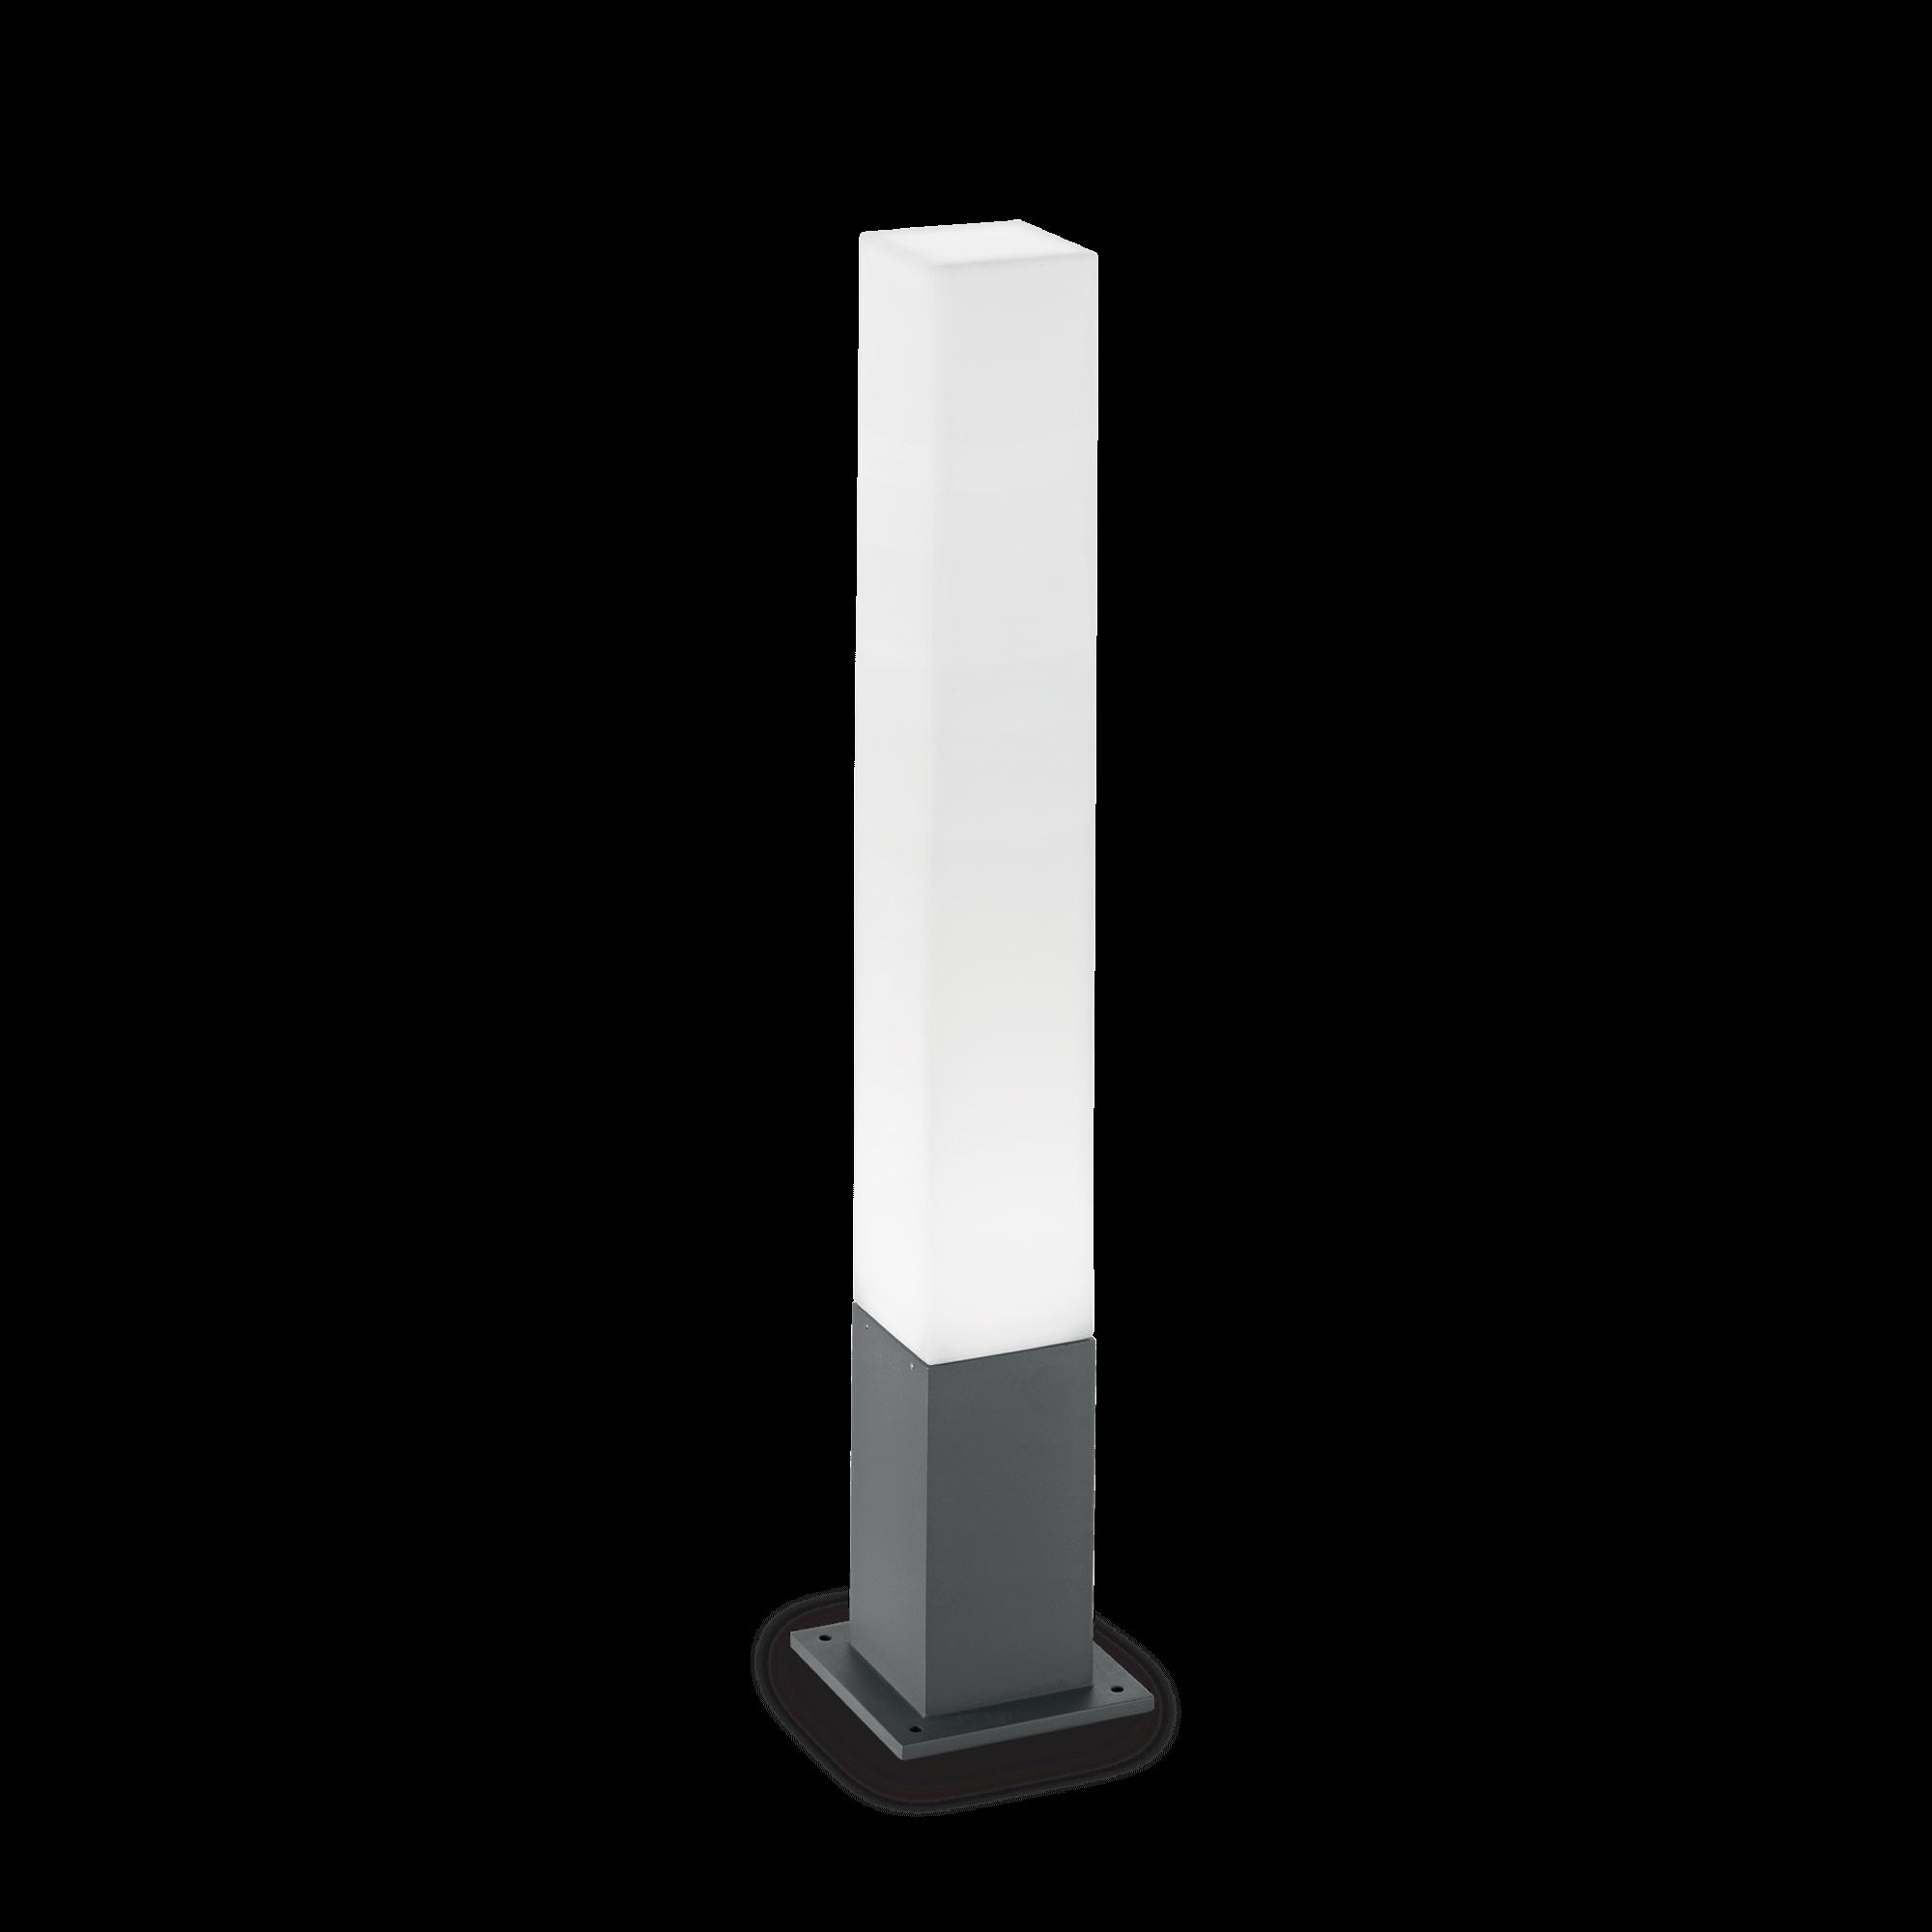 Ideal Lux 135762 Edo Outdoor PT1 Square Antracite kültéri állólámpa